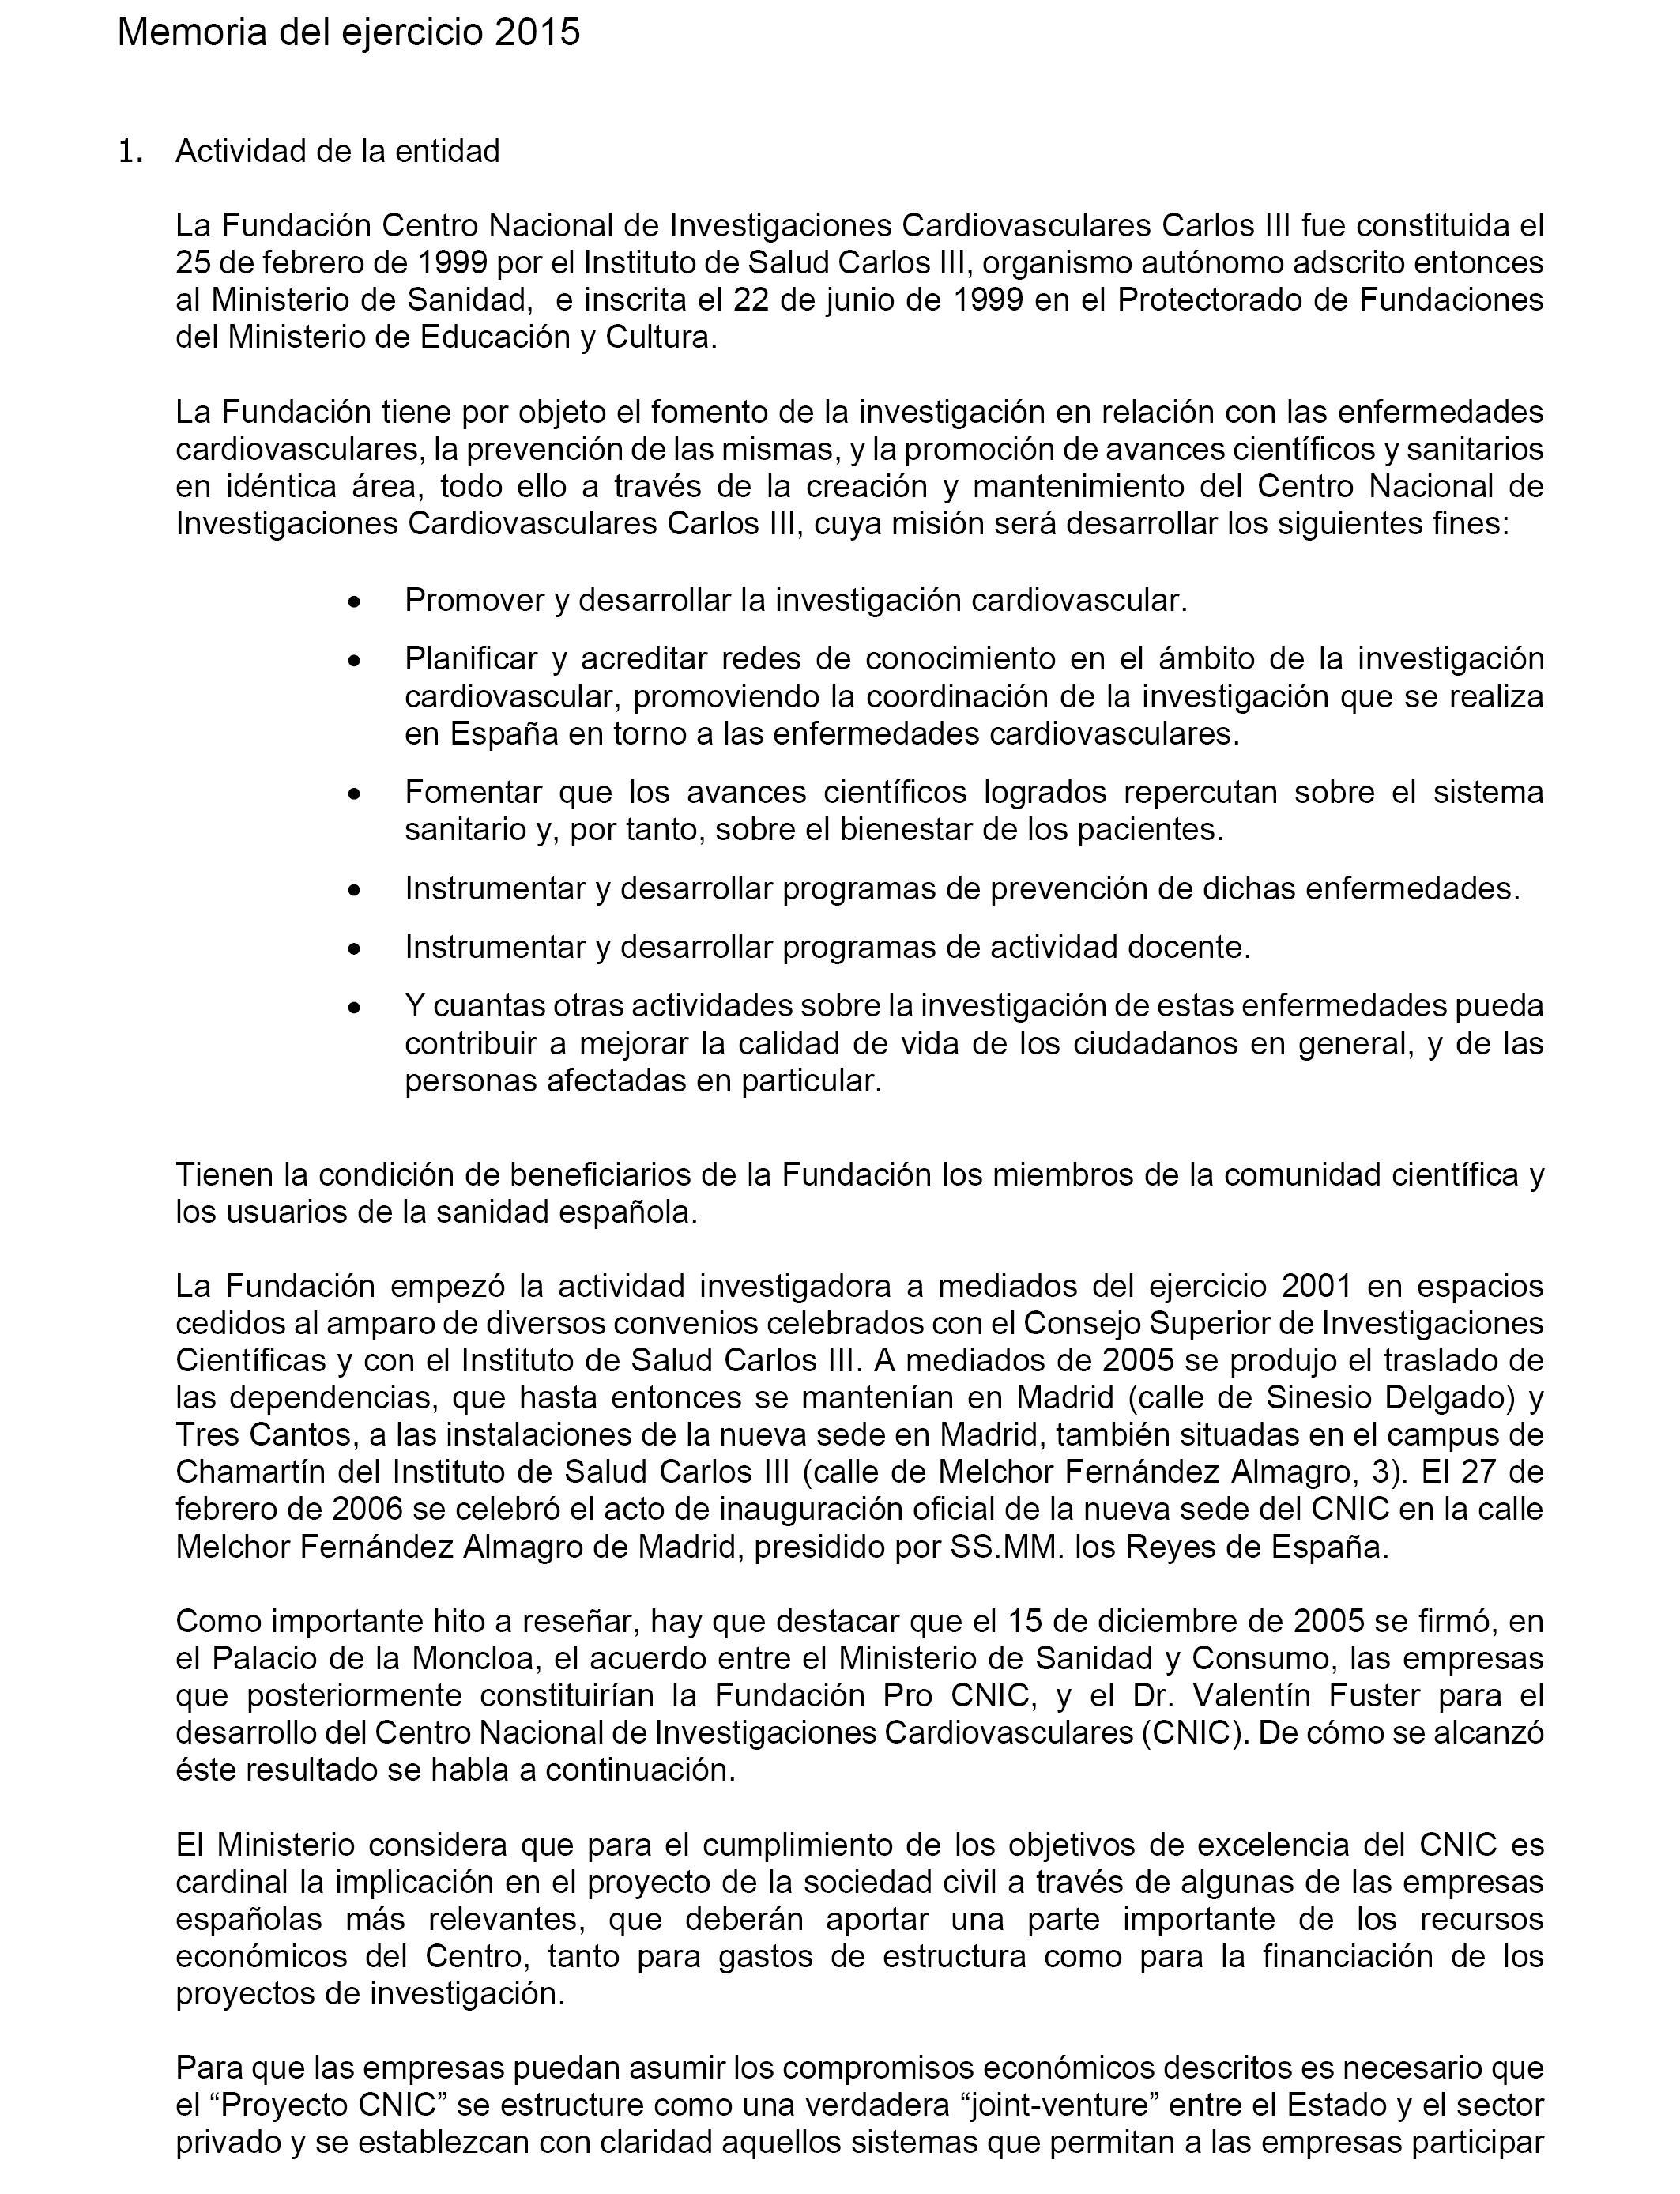 BOE.es - Documento BOE-A-2016-7559